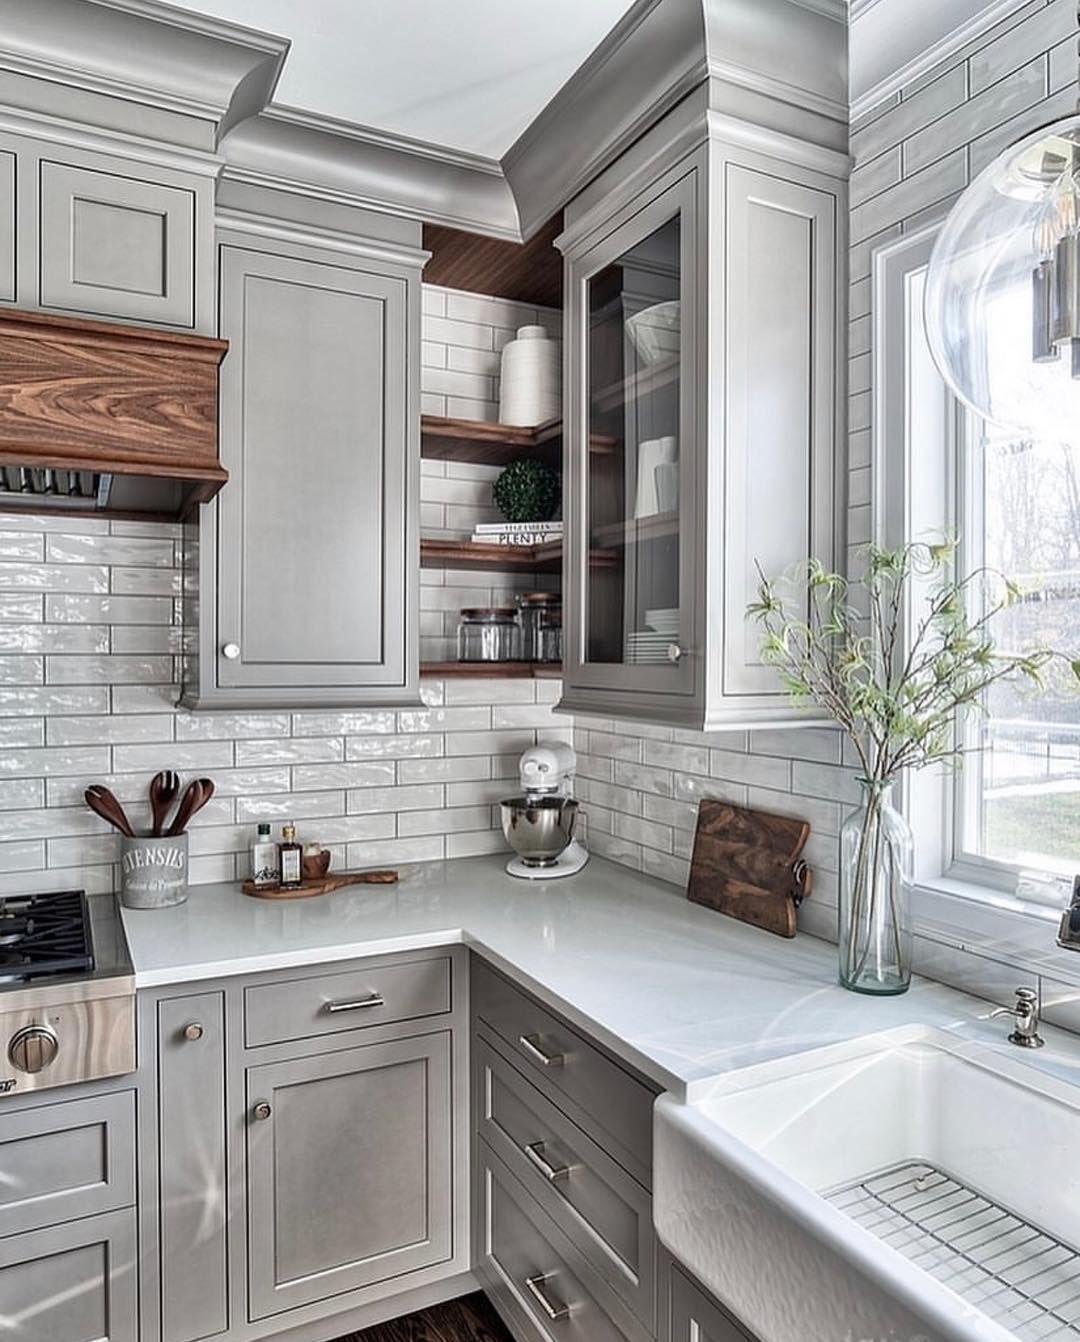 Rana Elshaer On Instagram Pre Holiday Kitchen Status Via Homebunch For More Inspirations Follow Kitchen Cabinet Design Grey Kitchen Designs Home Kitchens